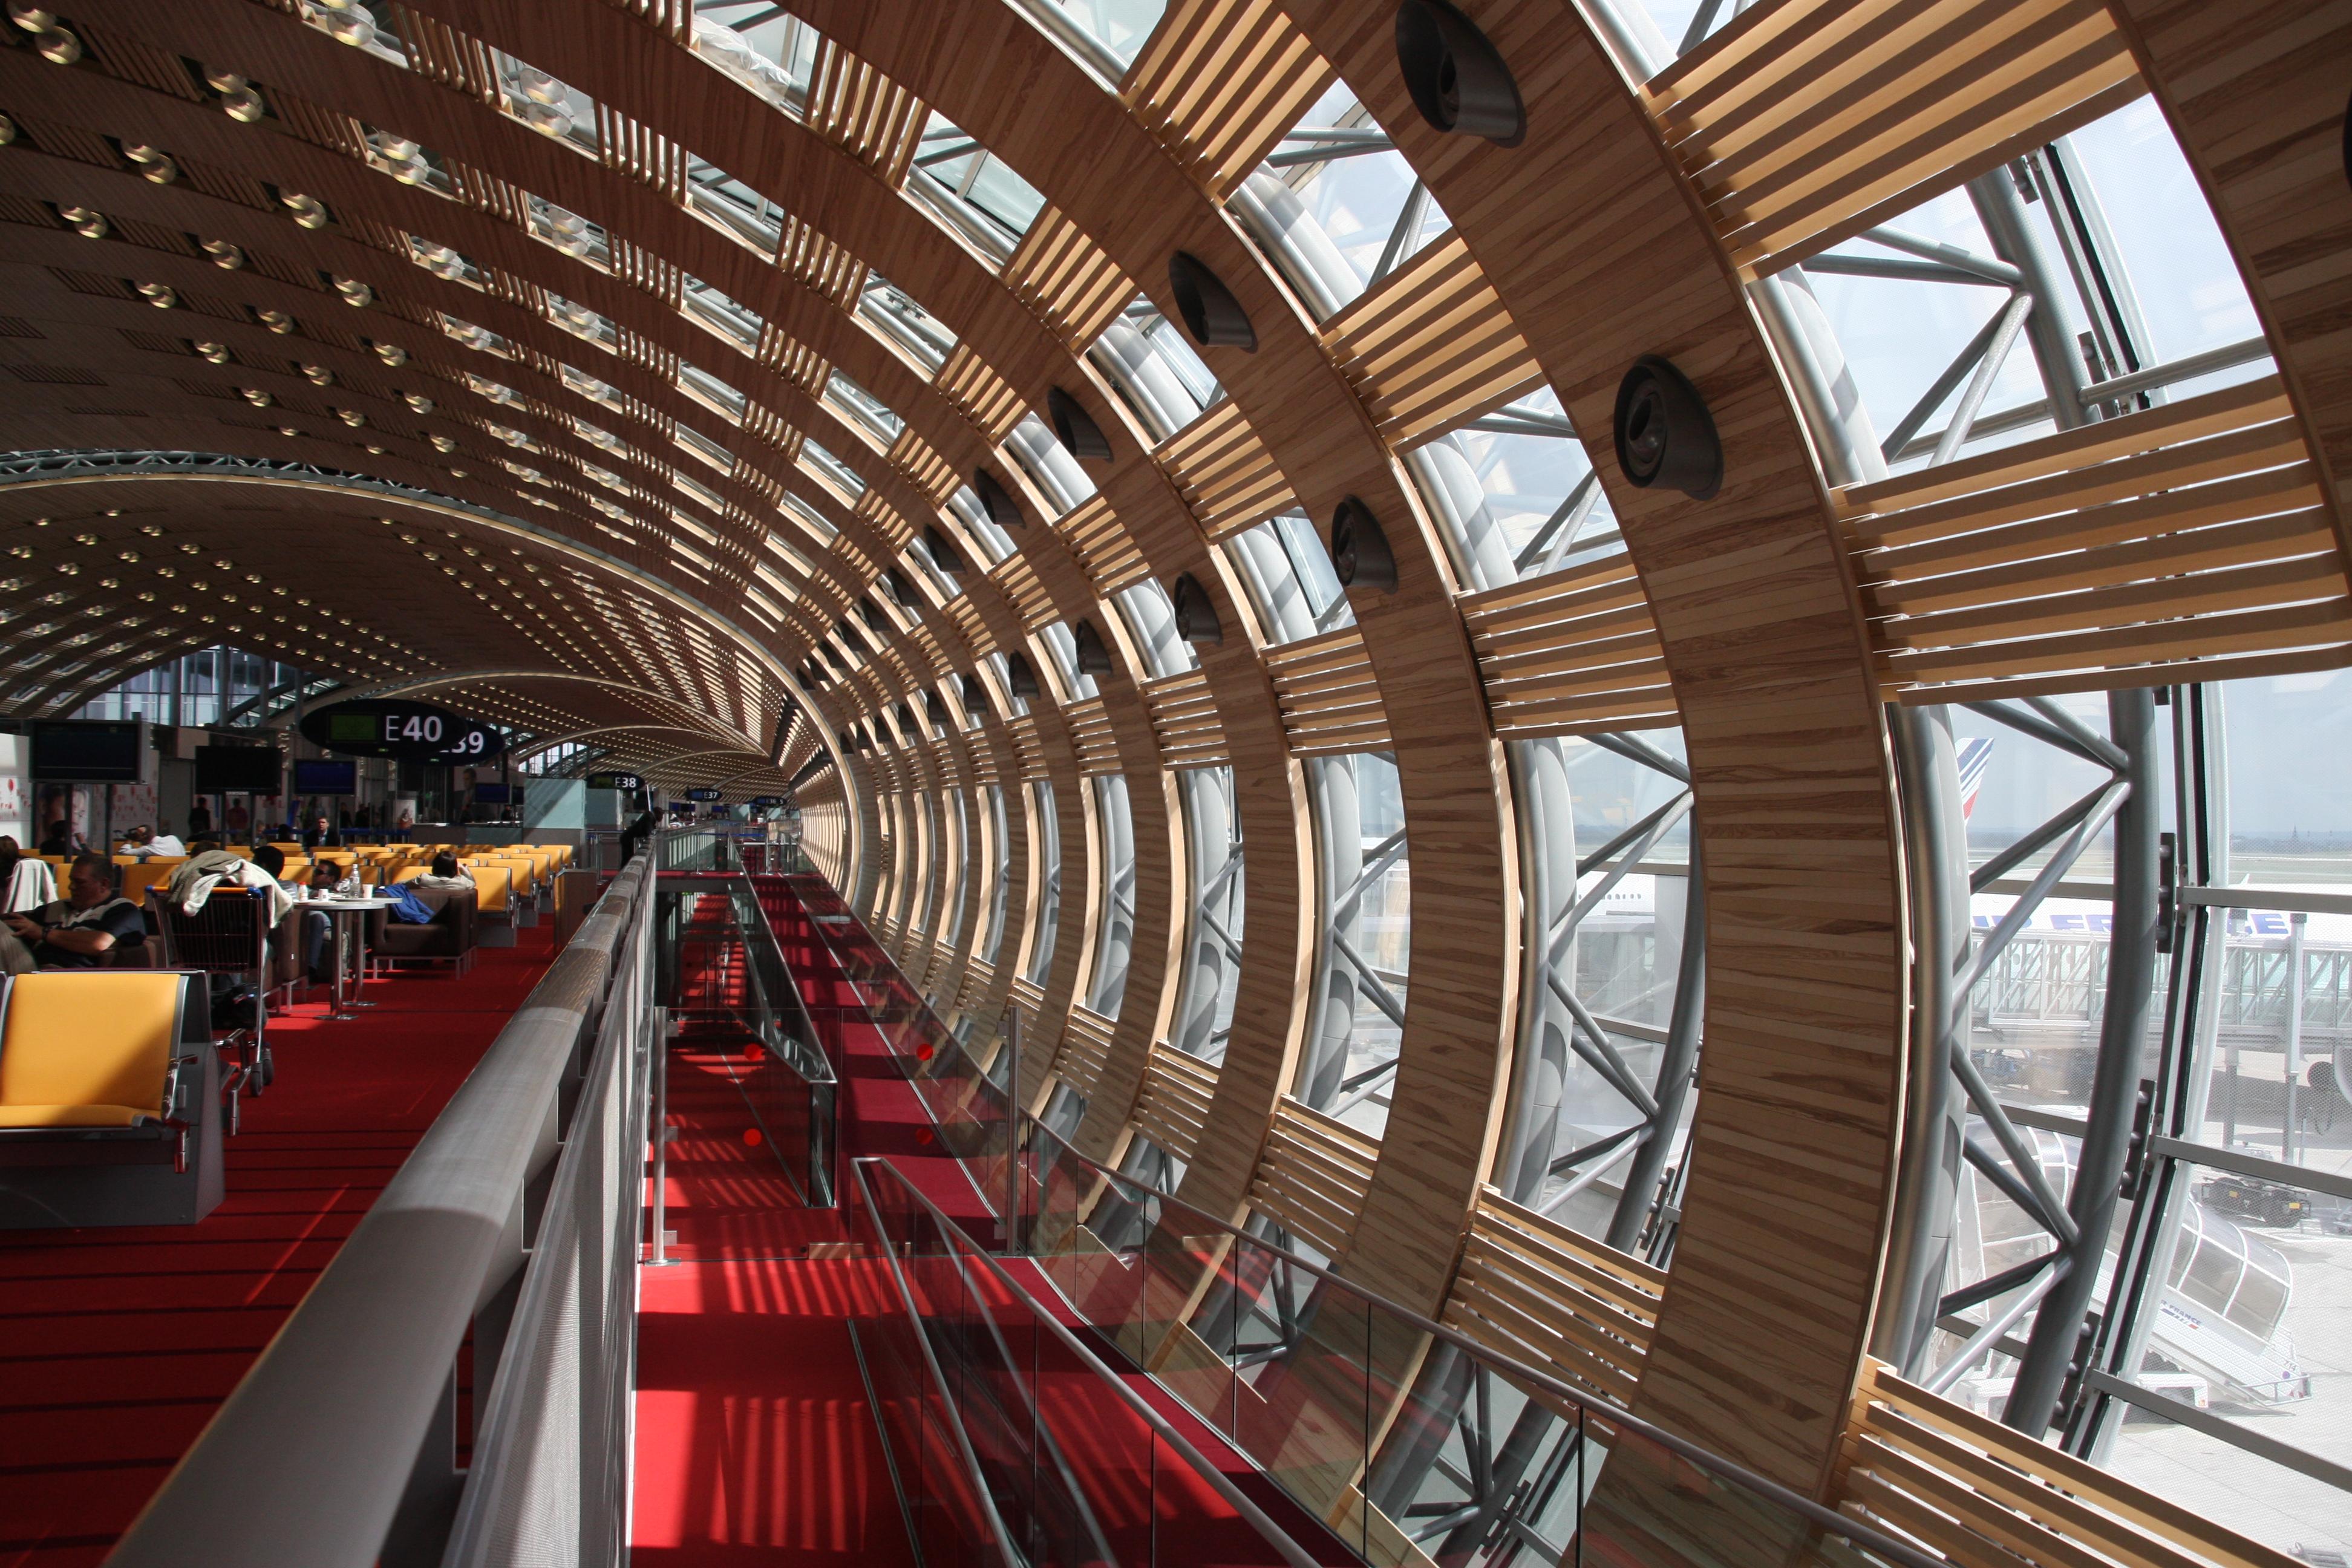 Indywidualna obsługa na lotnisku Charles De Gaulle – Paryż